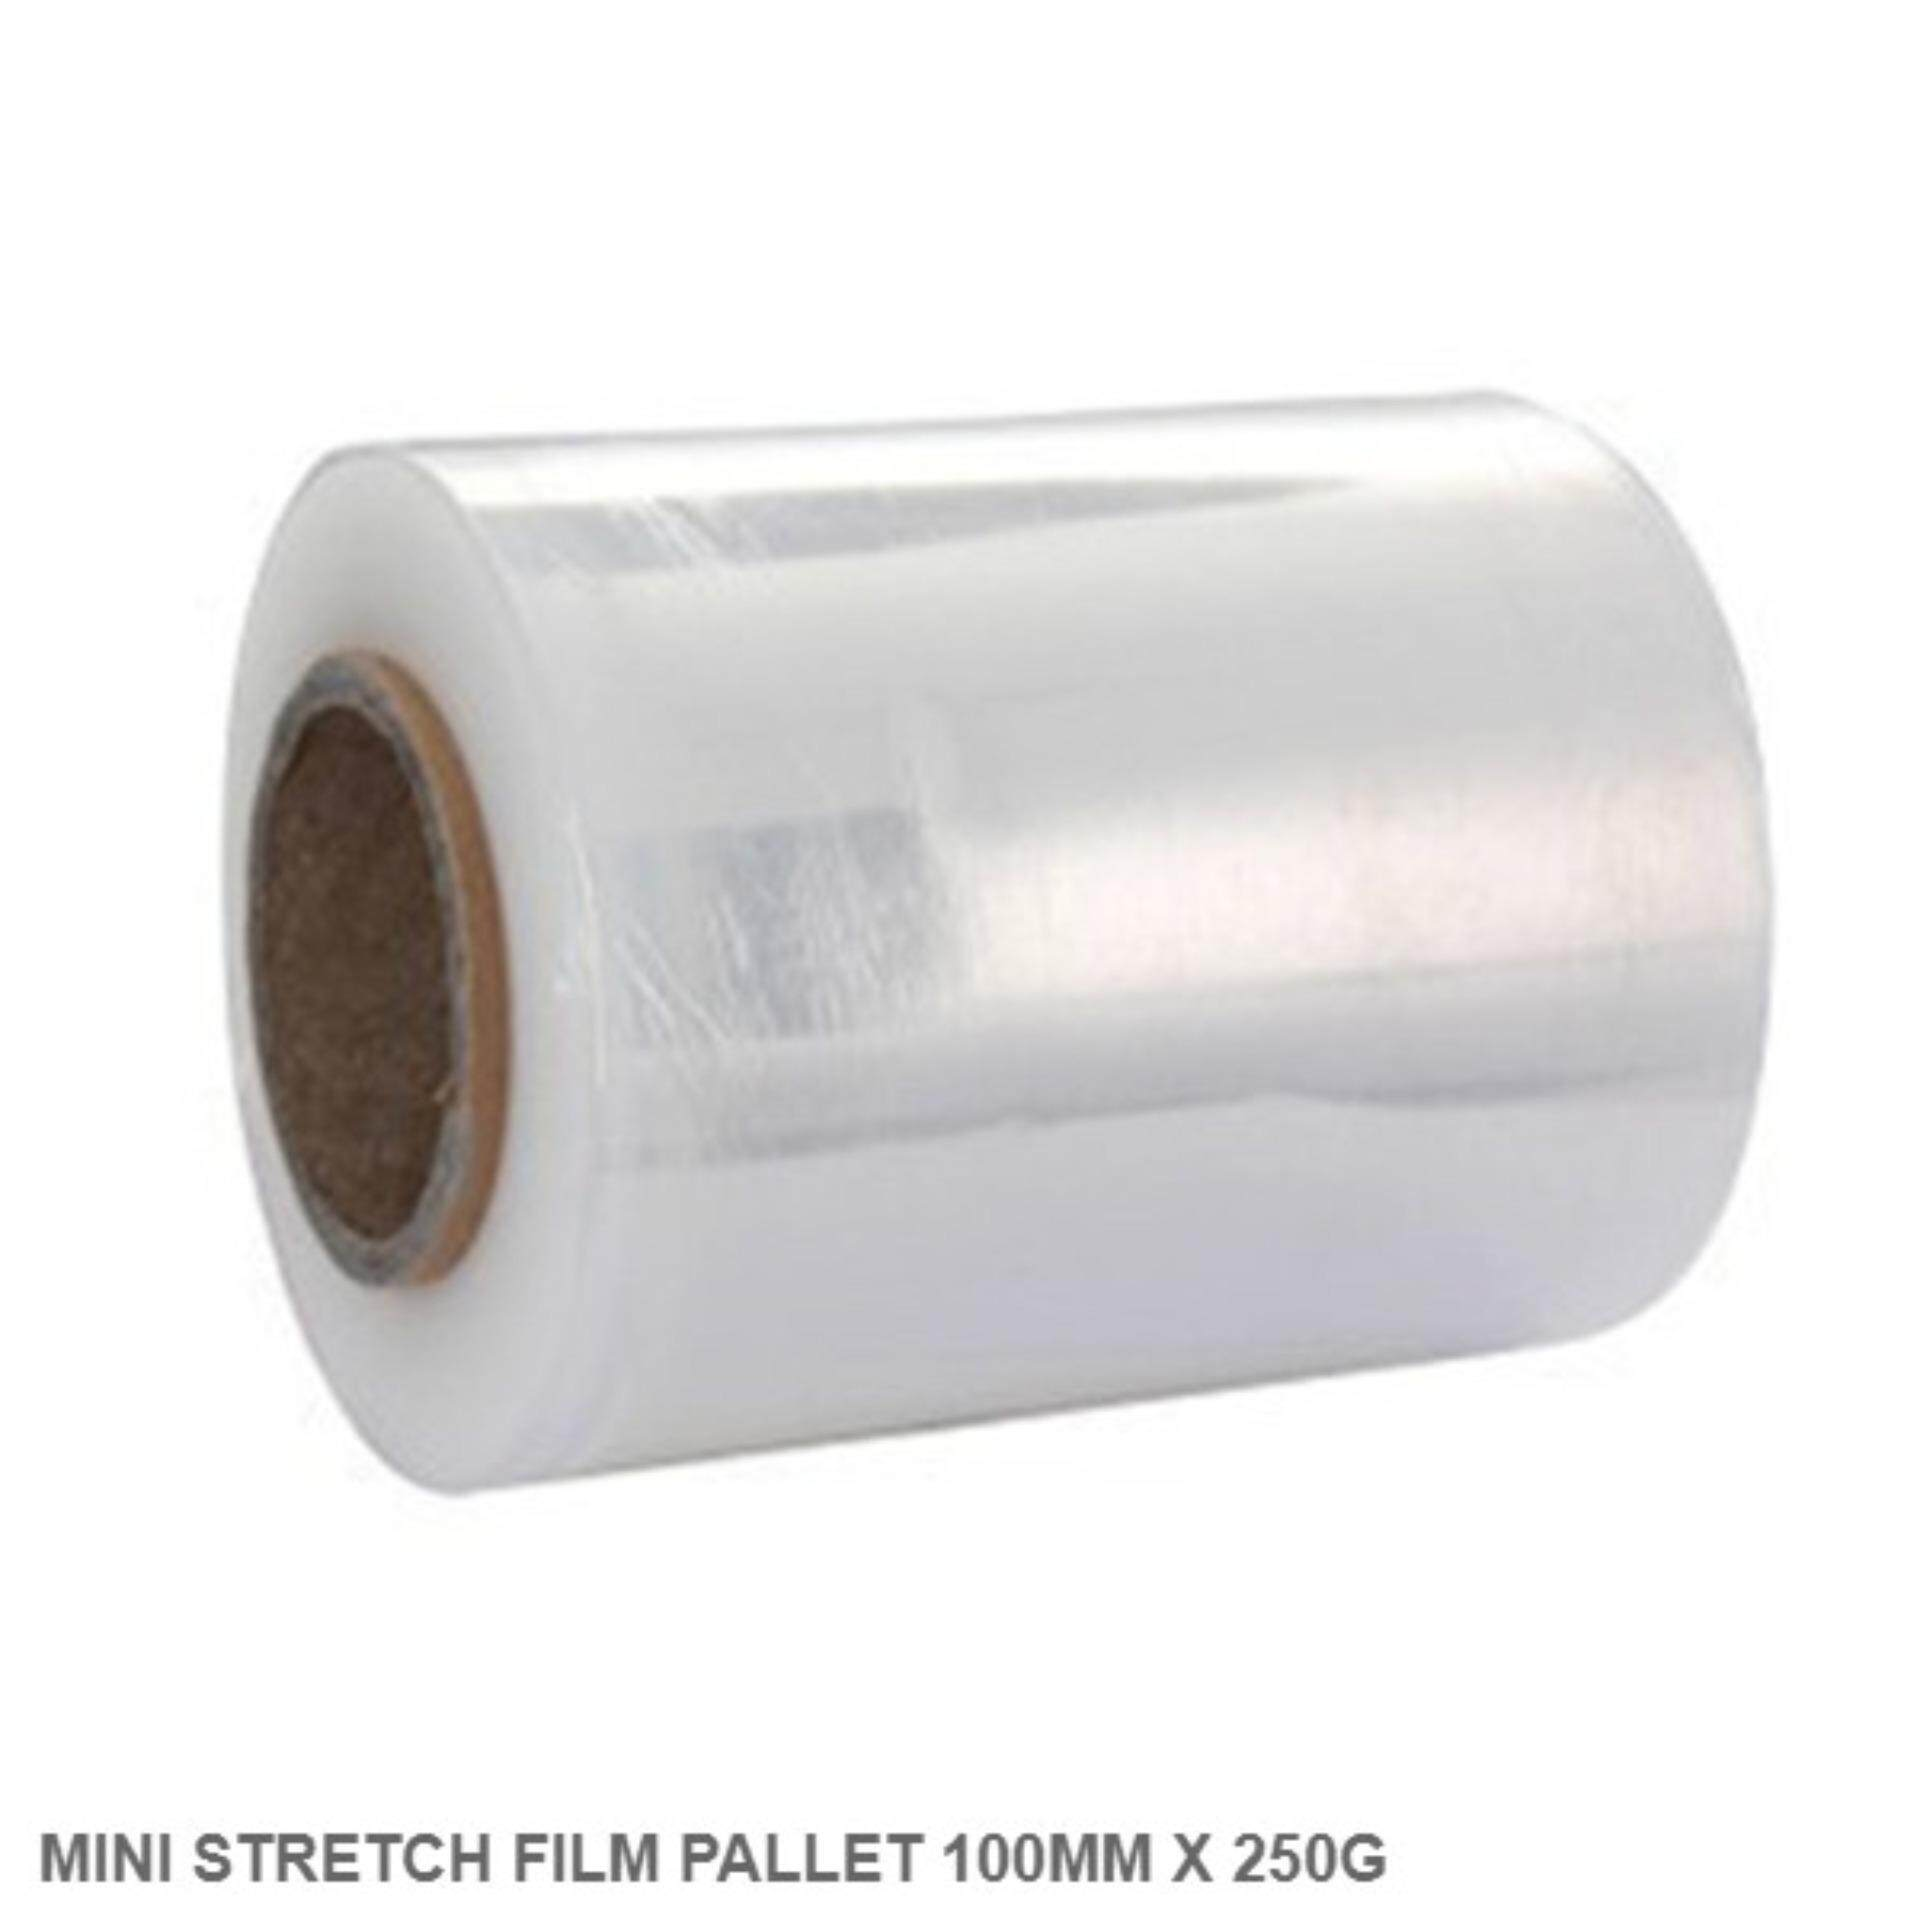 Baby Roll Mini Stretch Film 100mm X 250g X 1 Roll. By Mailingtree Marketing.